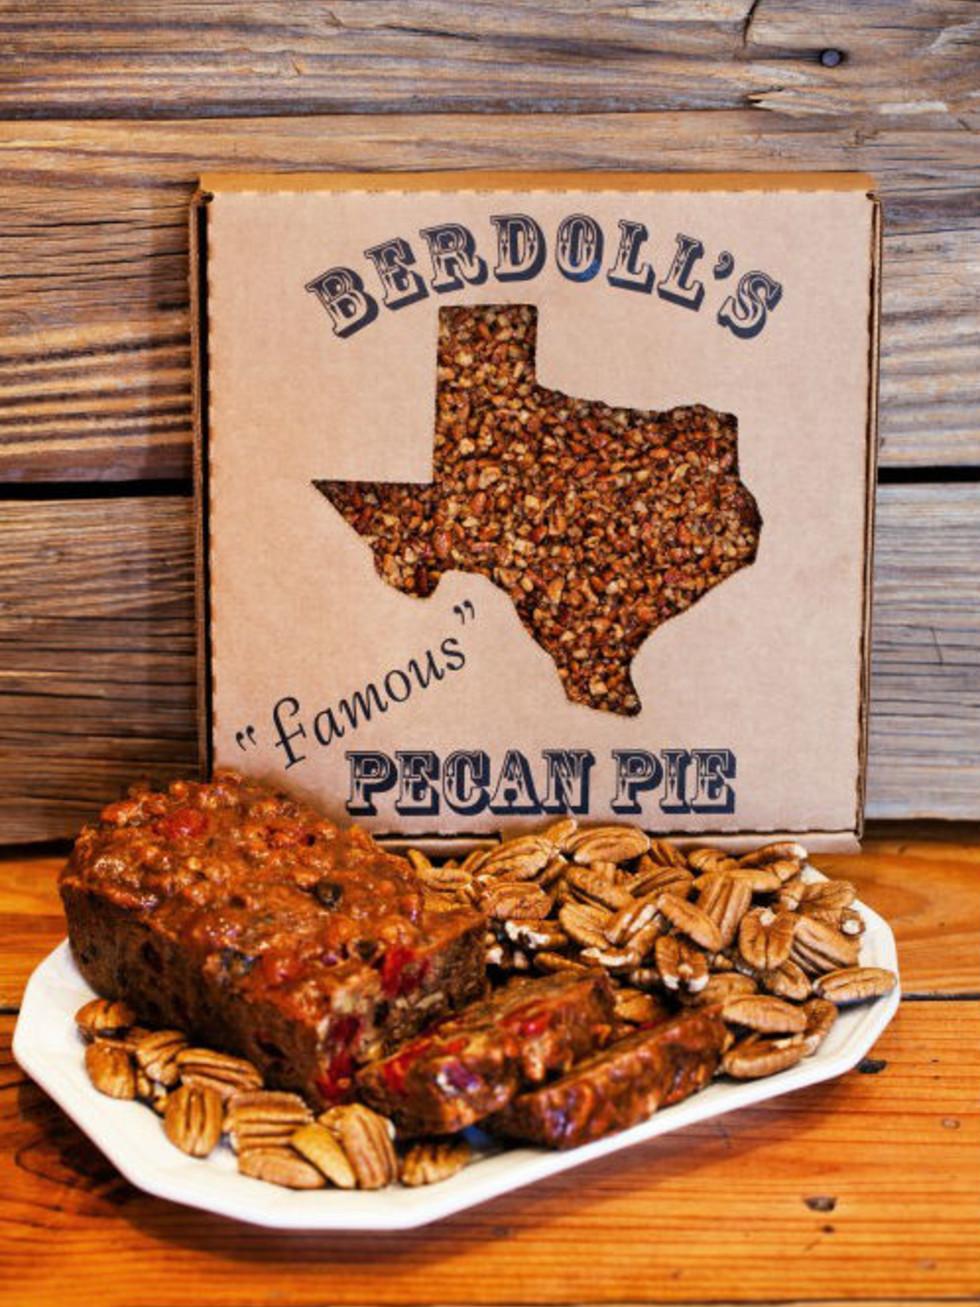 Berdoll's Pecan Pie